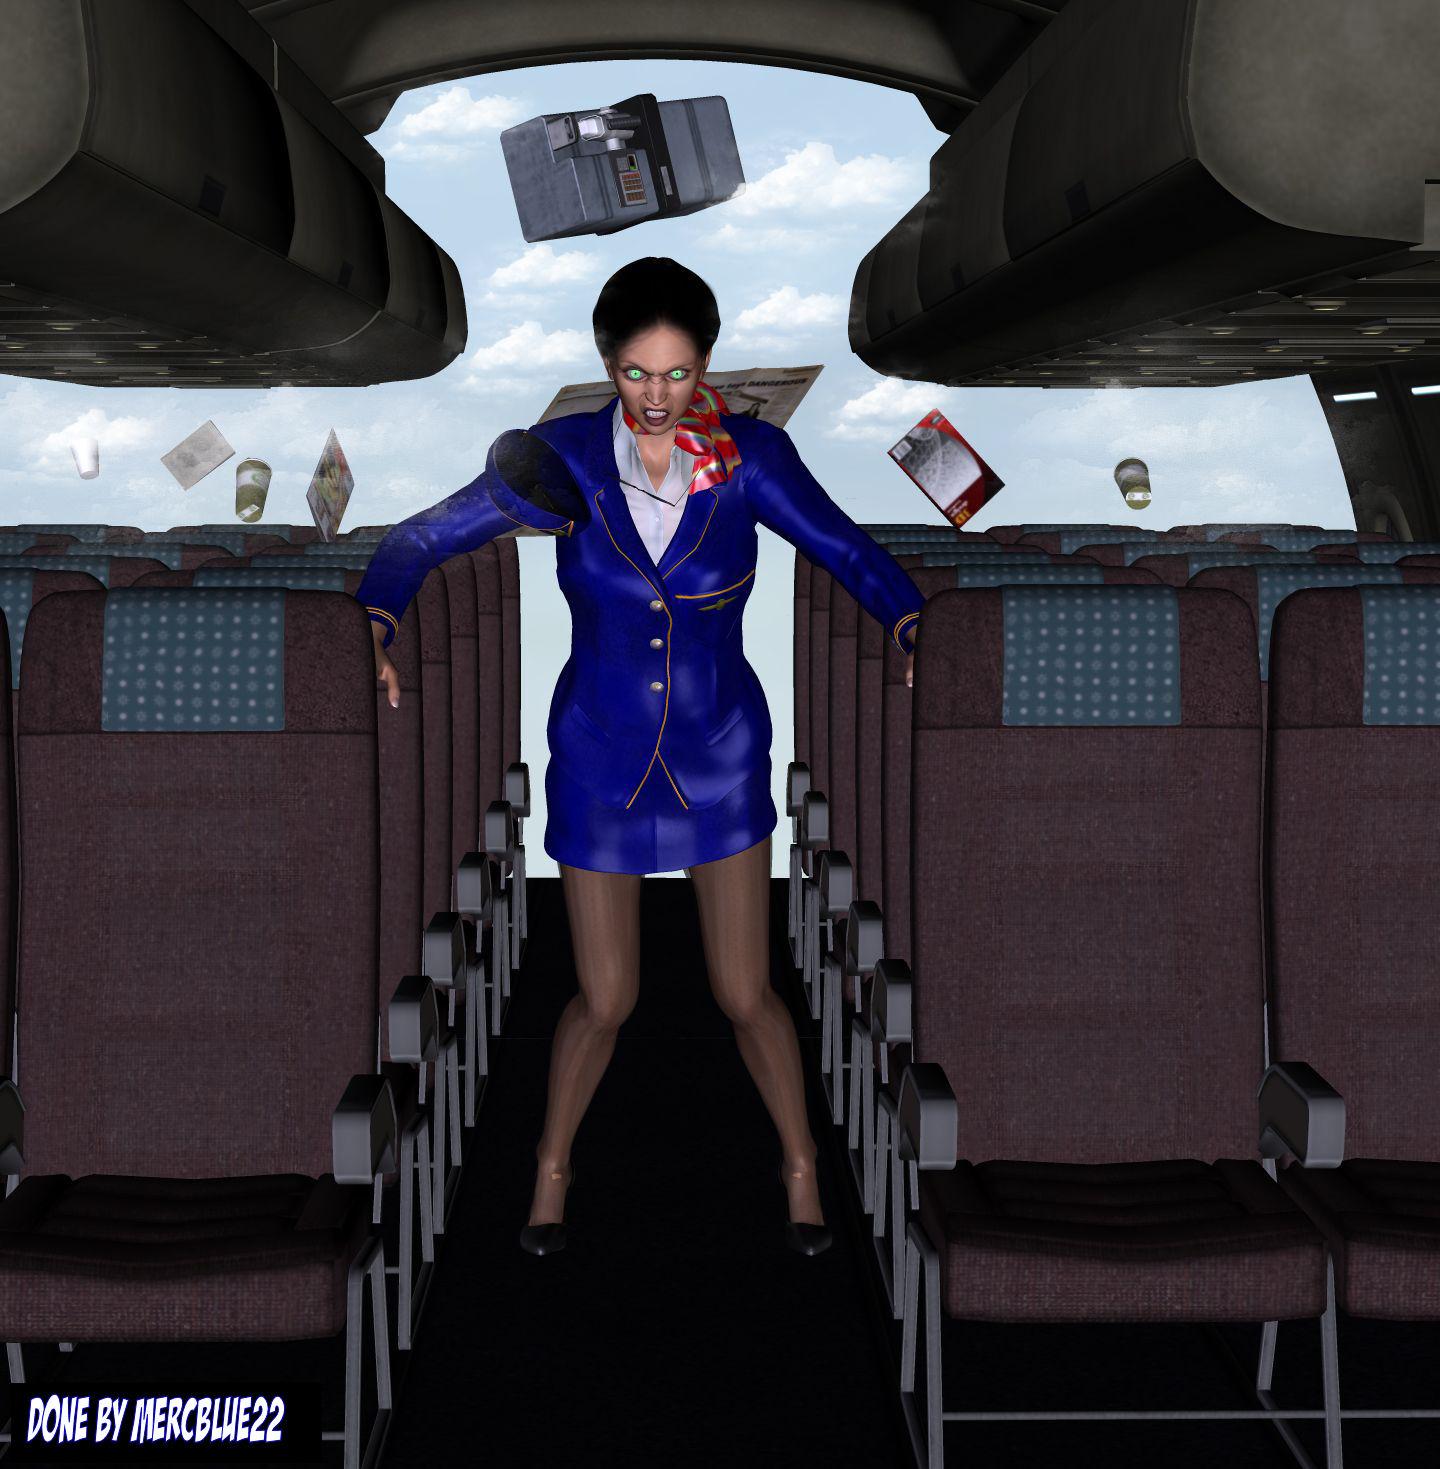 Plane Trouble SheHulk by mercblue22 on DeviantArt  Plane Trouble S...